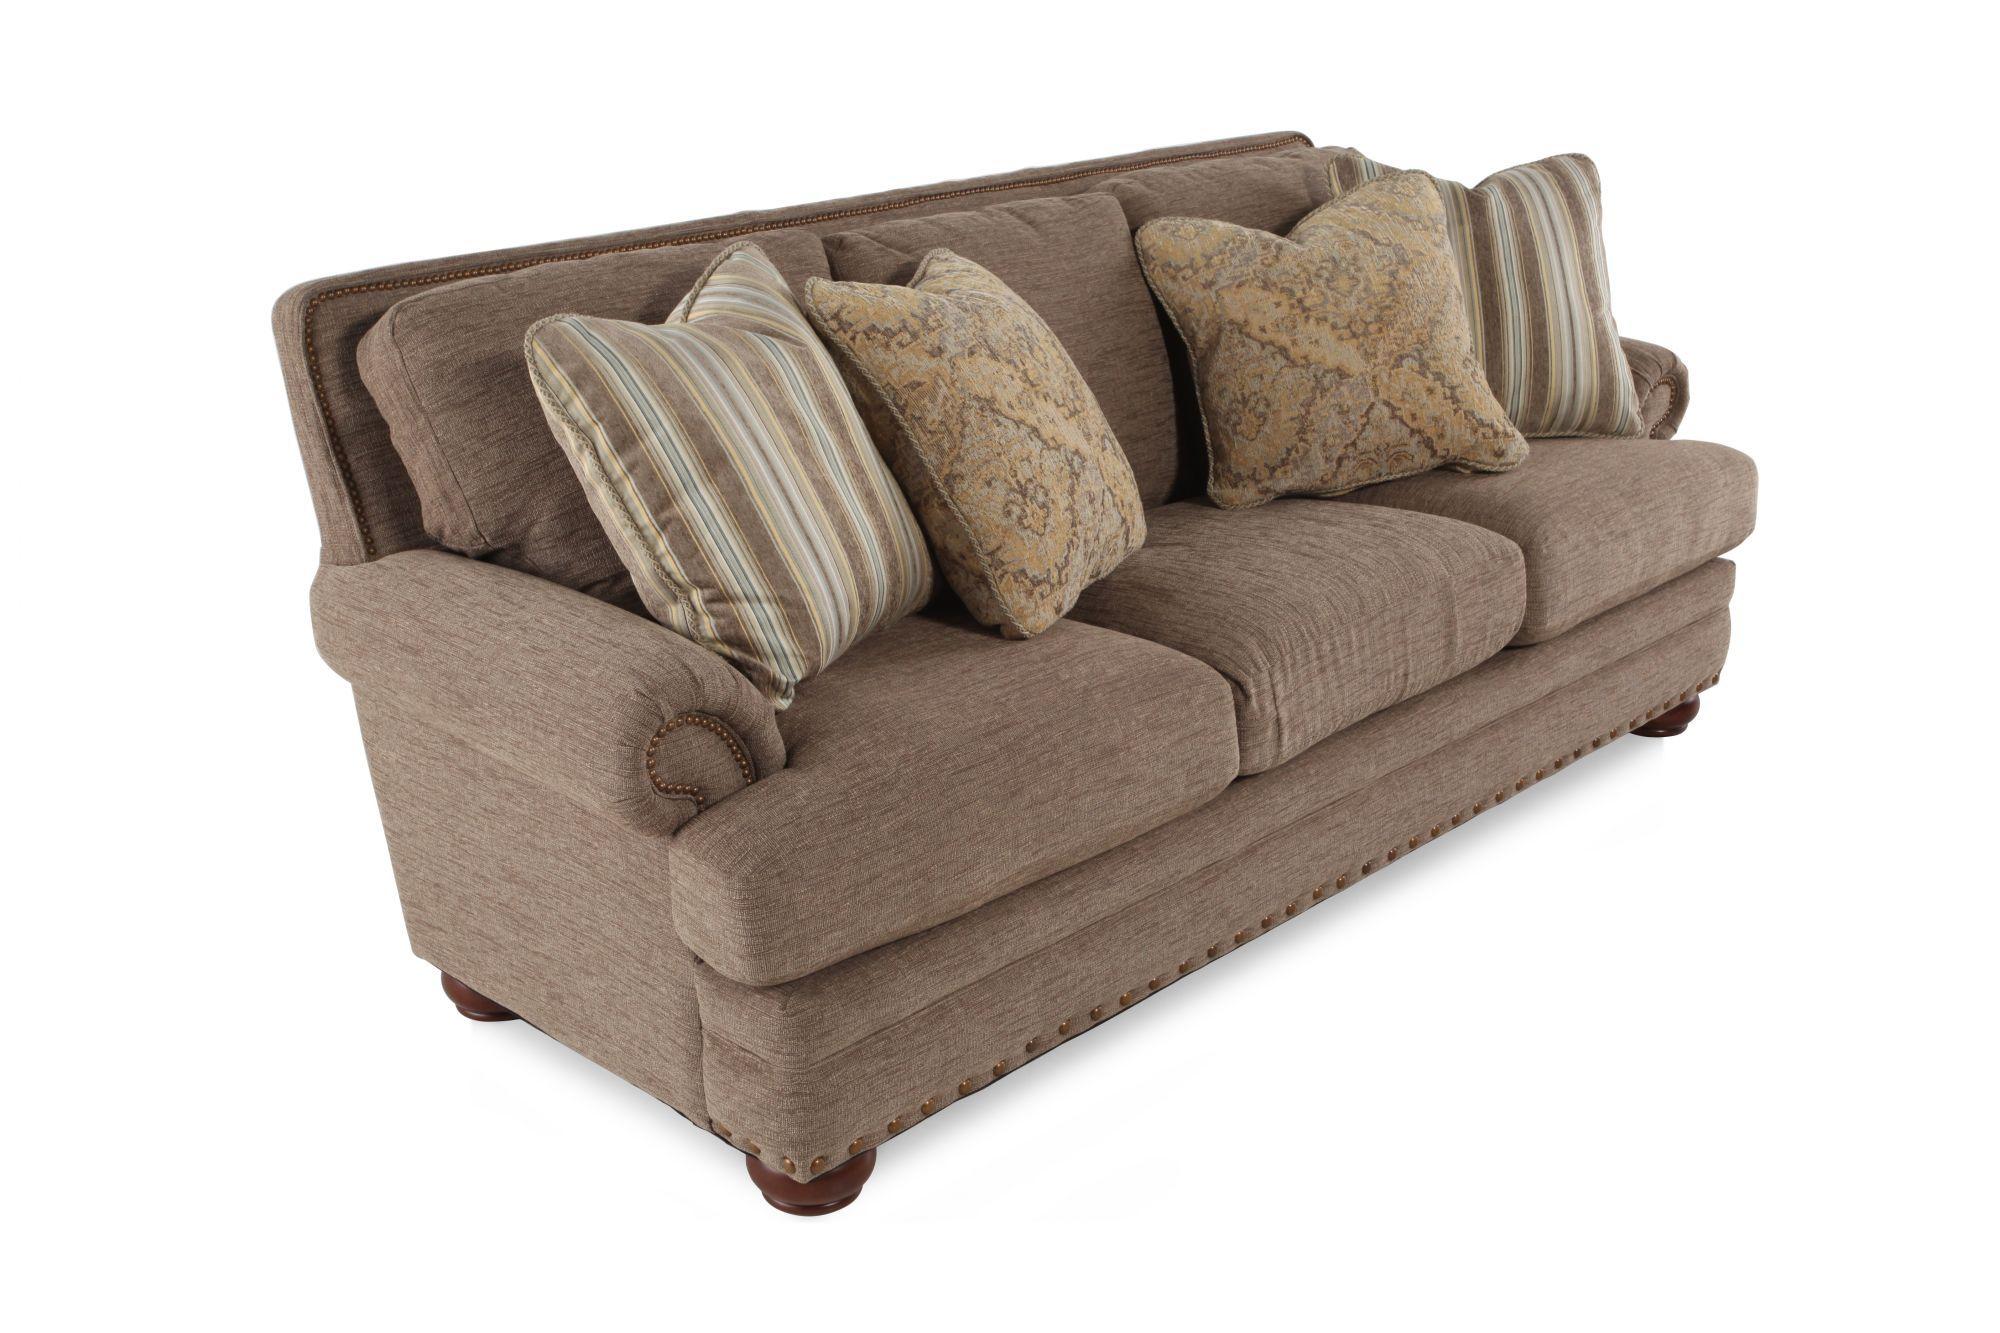 La Z Boy Brennan Bark Sofa | Furniture In 2018 | Pinterest | Sofa For Brennan Sofa Chairs (Image 15 of 20)